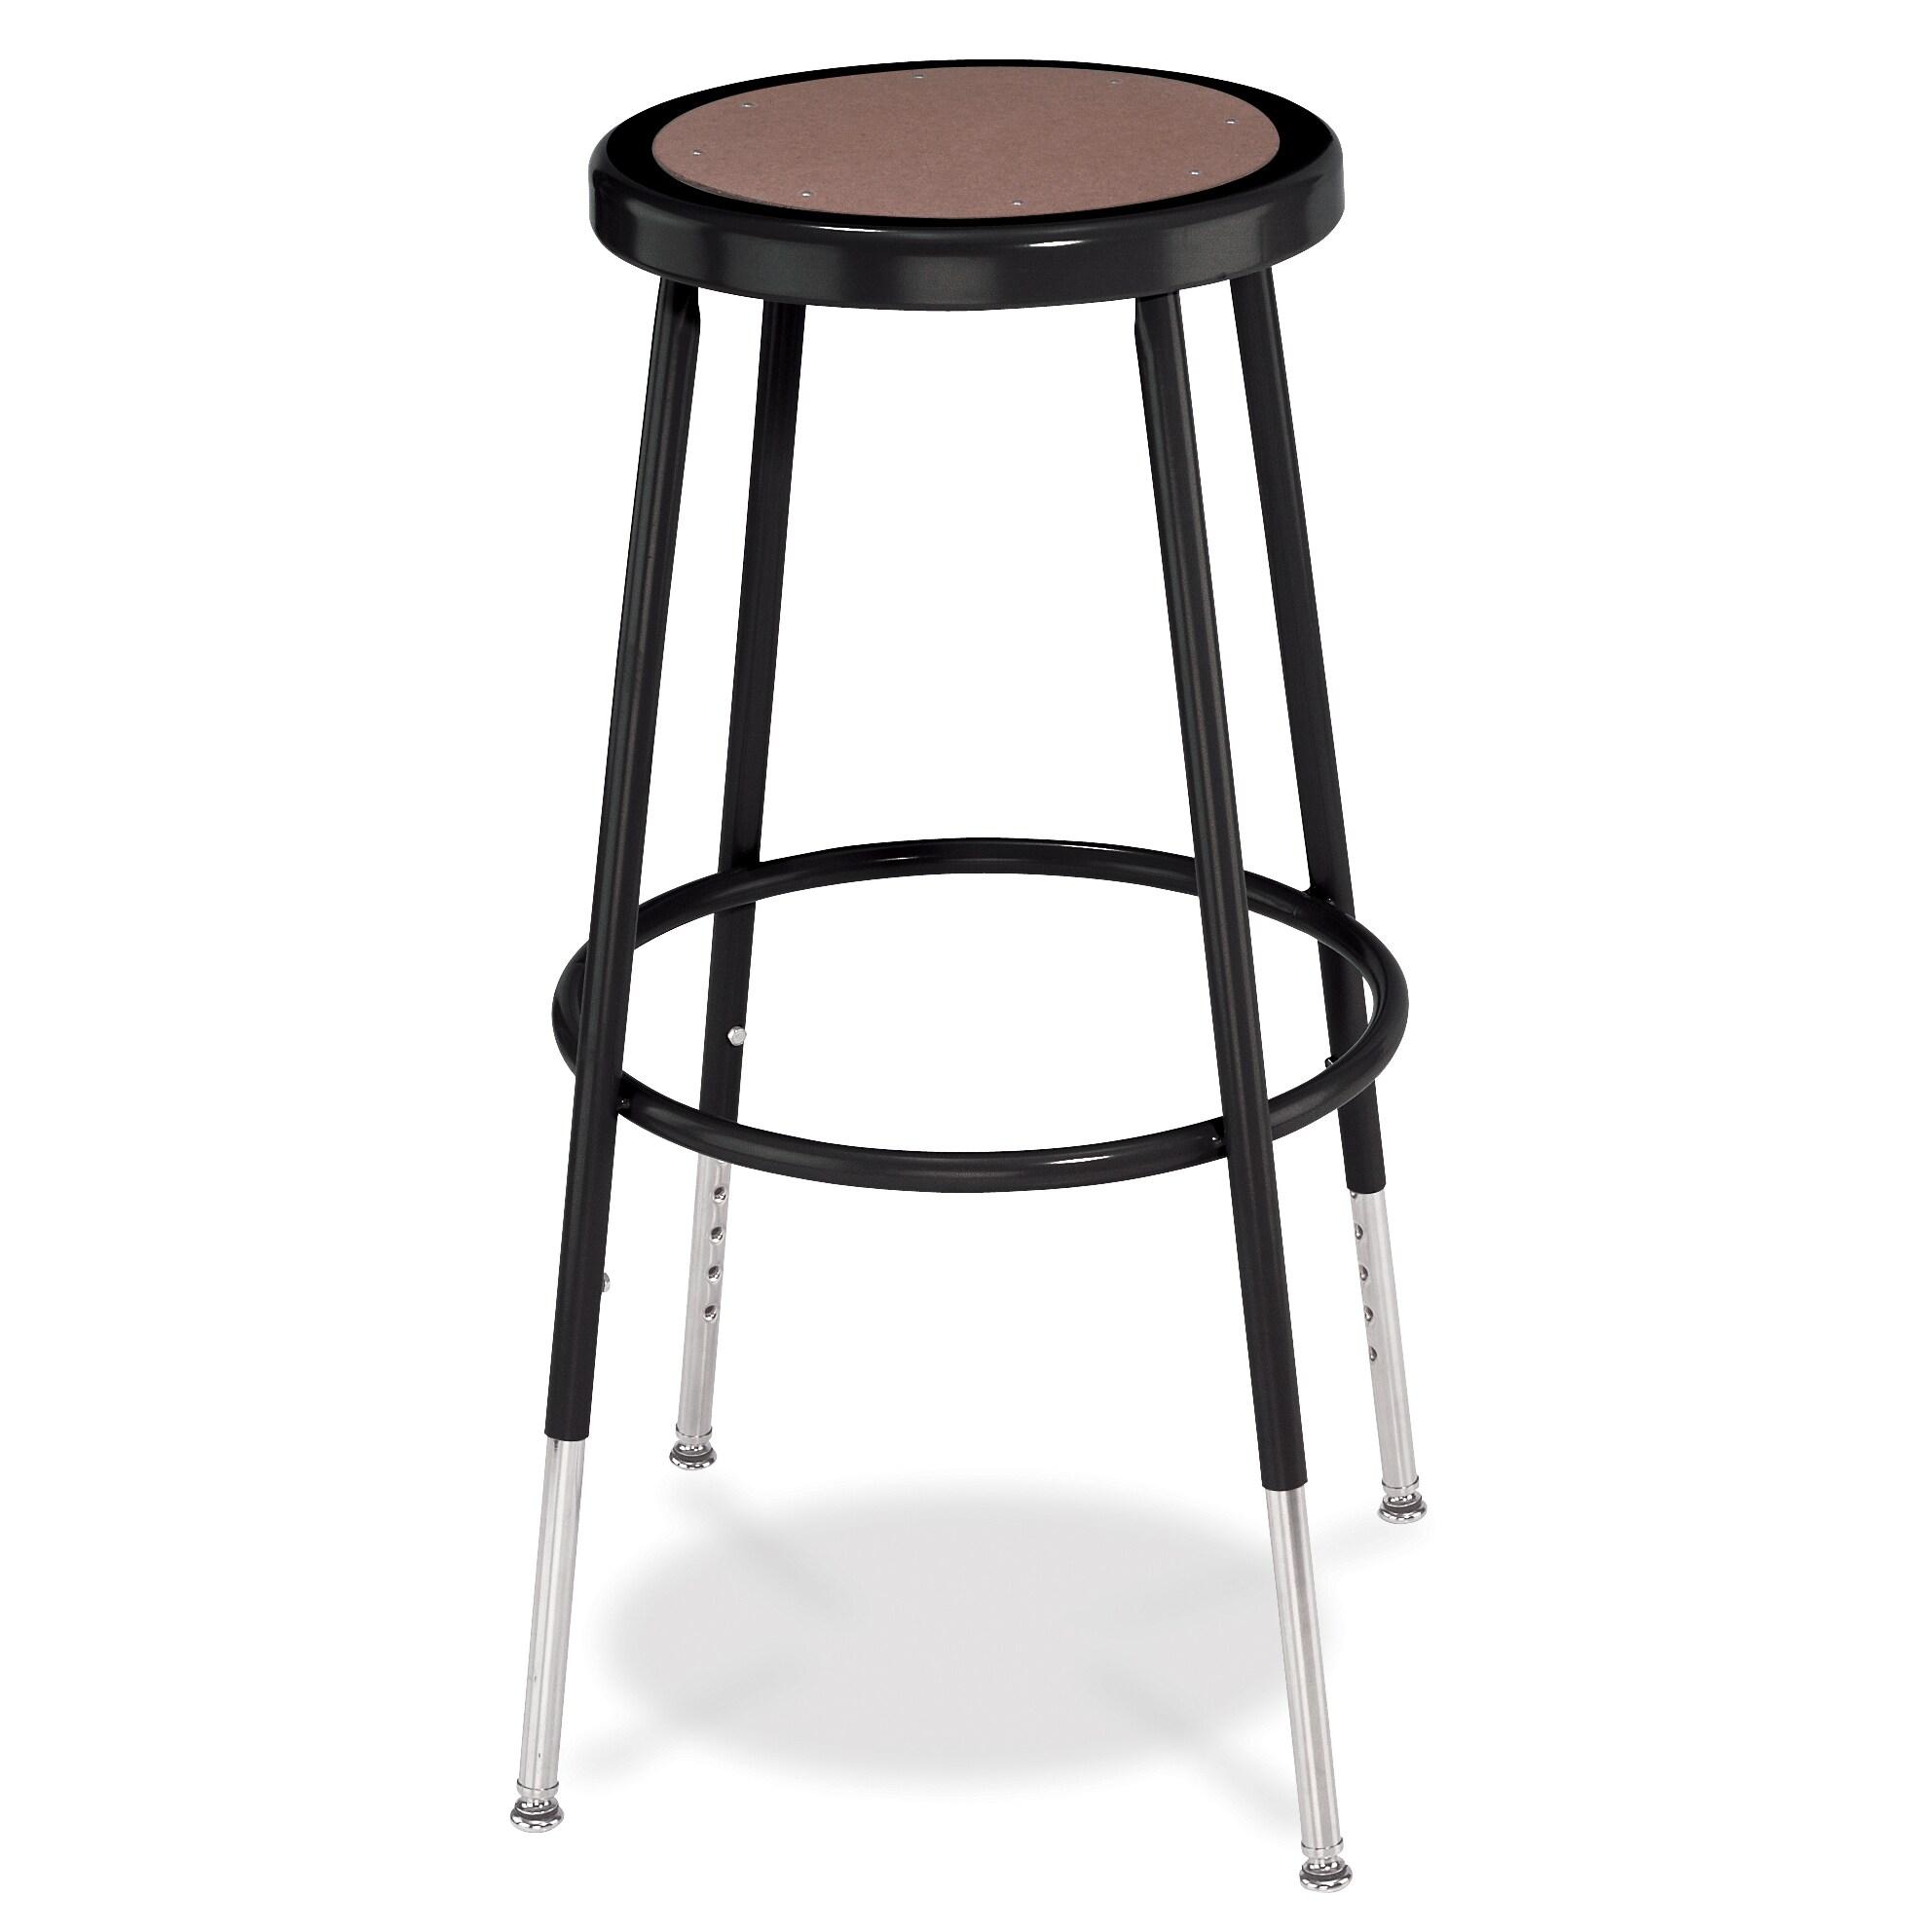 National Public Seating Adjustable Height Black Round Seat Stool (Black Stool w/ Round Hardboard Seat - 25-33H)